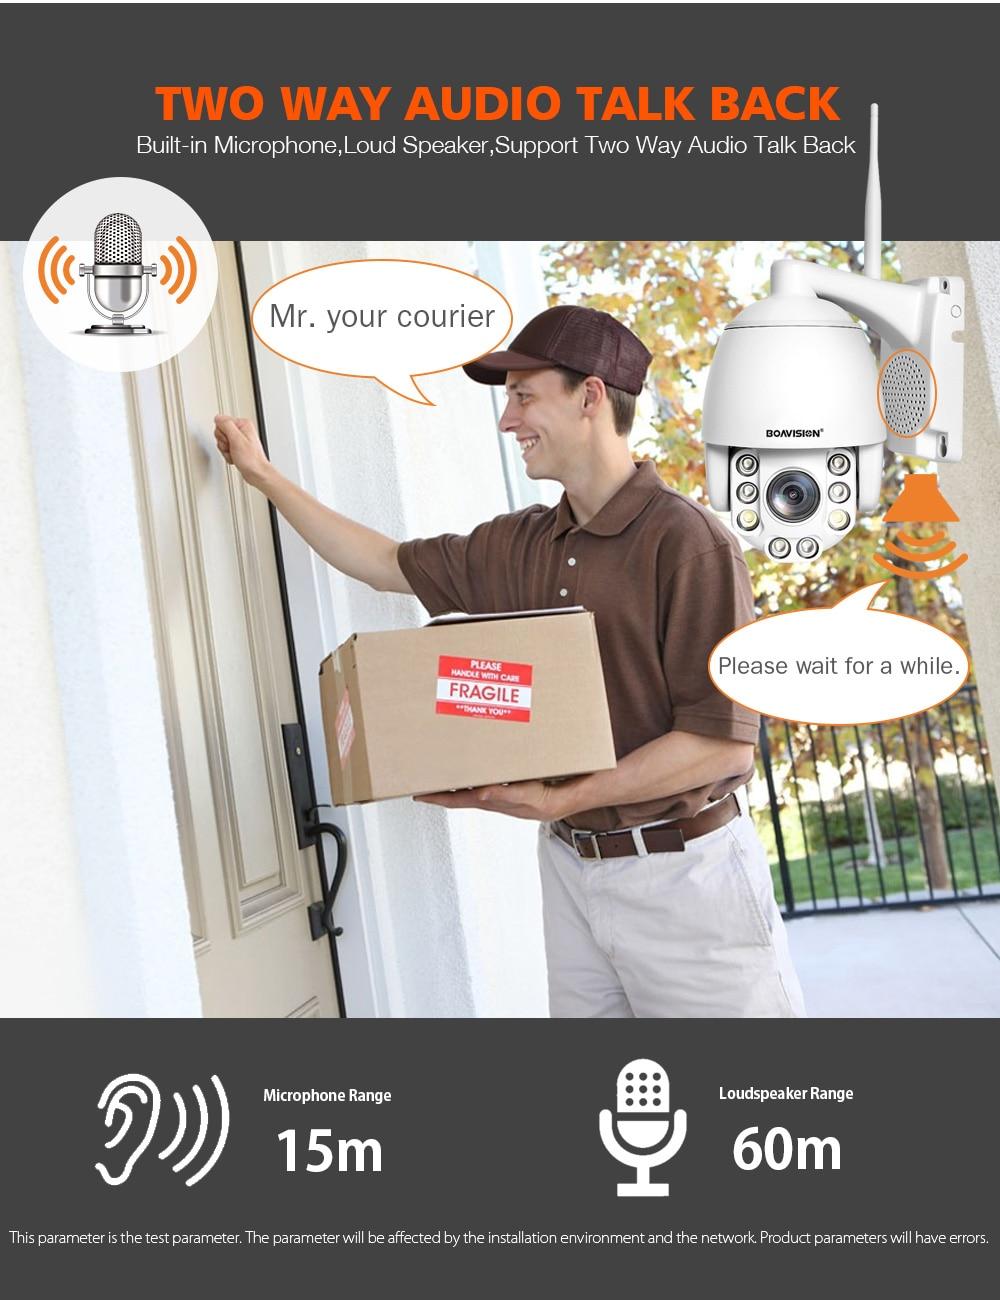 HTB1hjPraHr1gK0jSZR0q6zP8XXaq Wifi PTZ IP Camera 1080P 3MP 5MP Super HD 5X Zoom Two Way Audio Wireless PTZ Cam Outdoor 60m IR Video Home Security Camera P2P